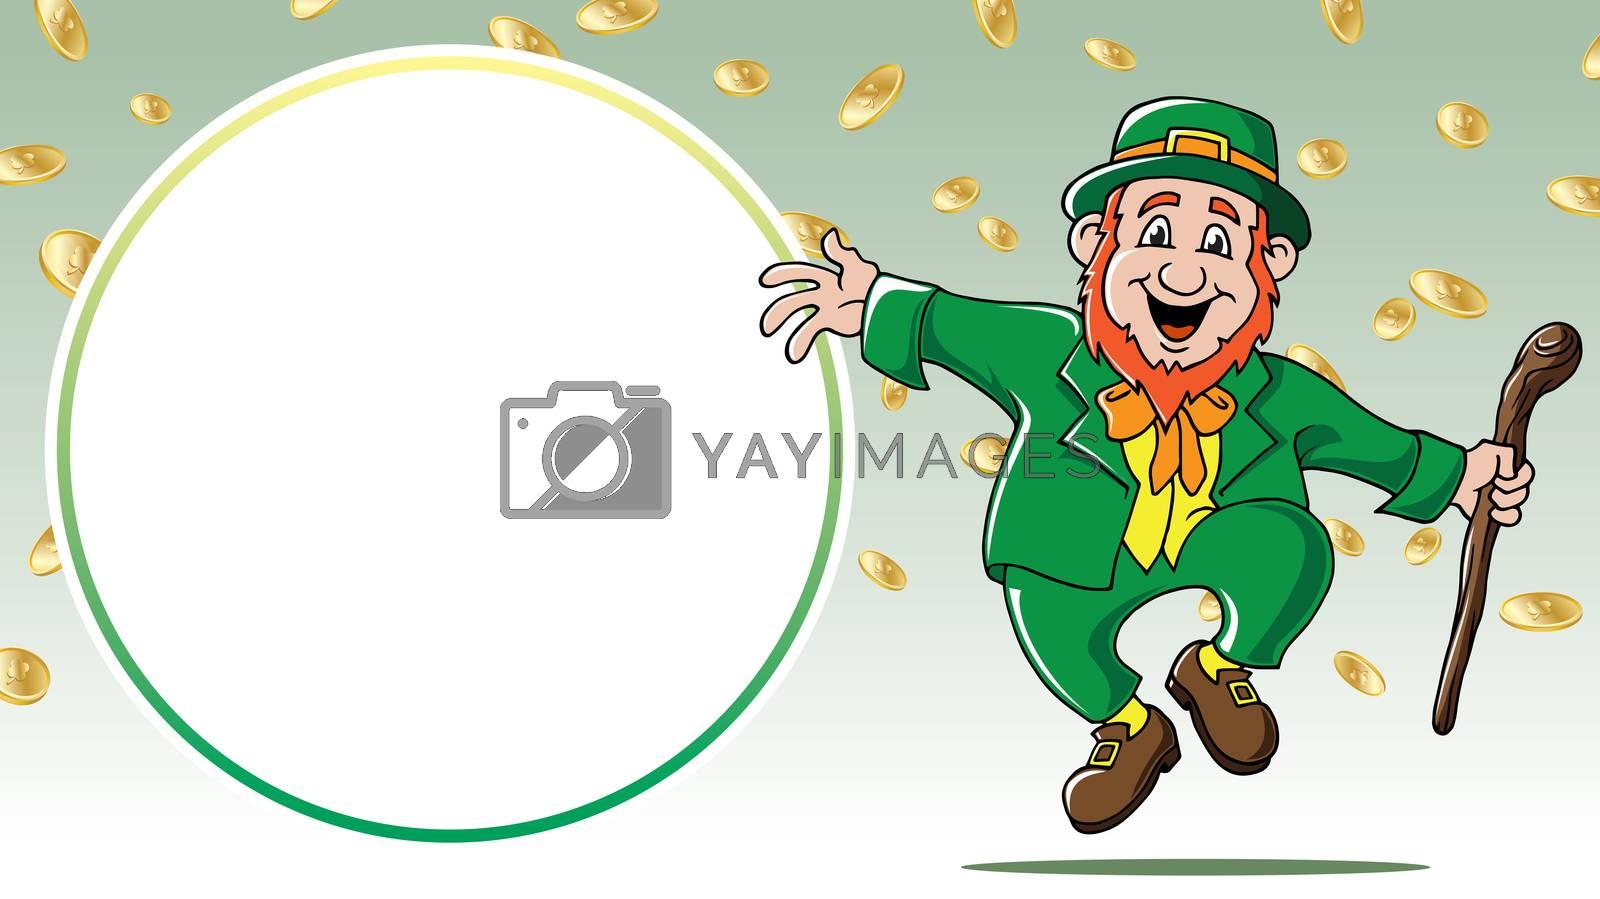 Saint Patrick's Day leprechaun dancing among gold coins retail sale